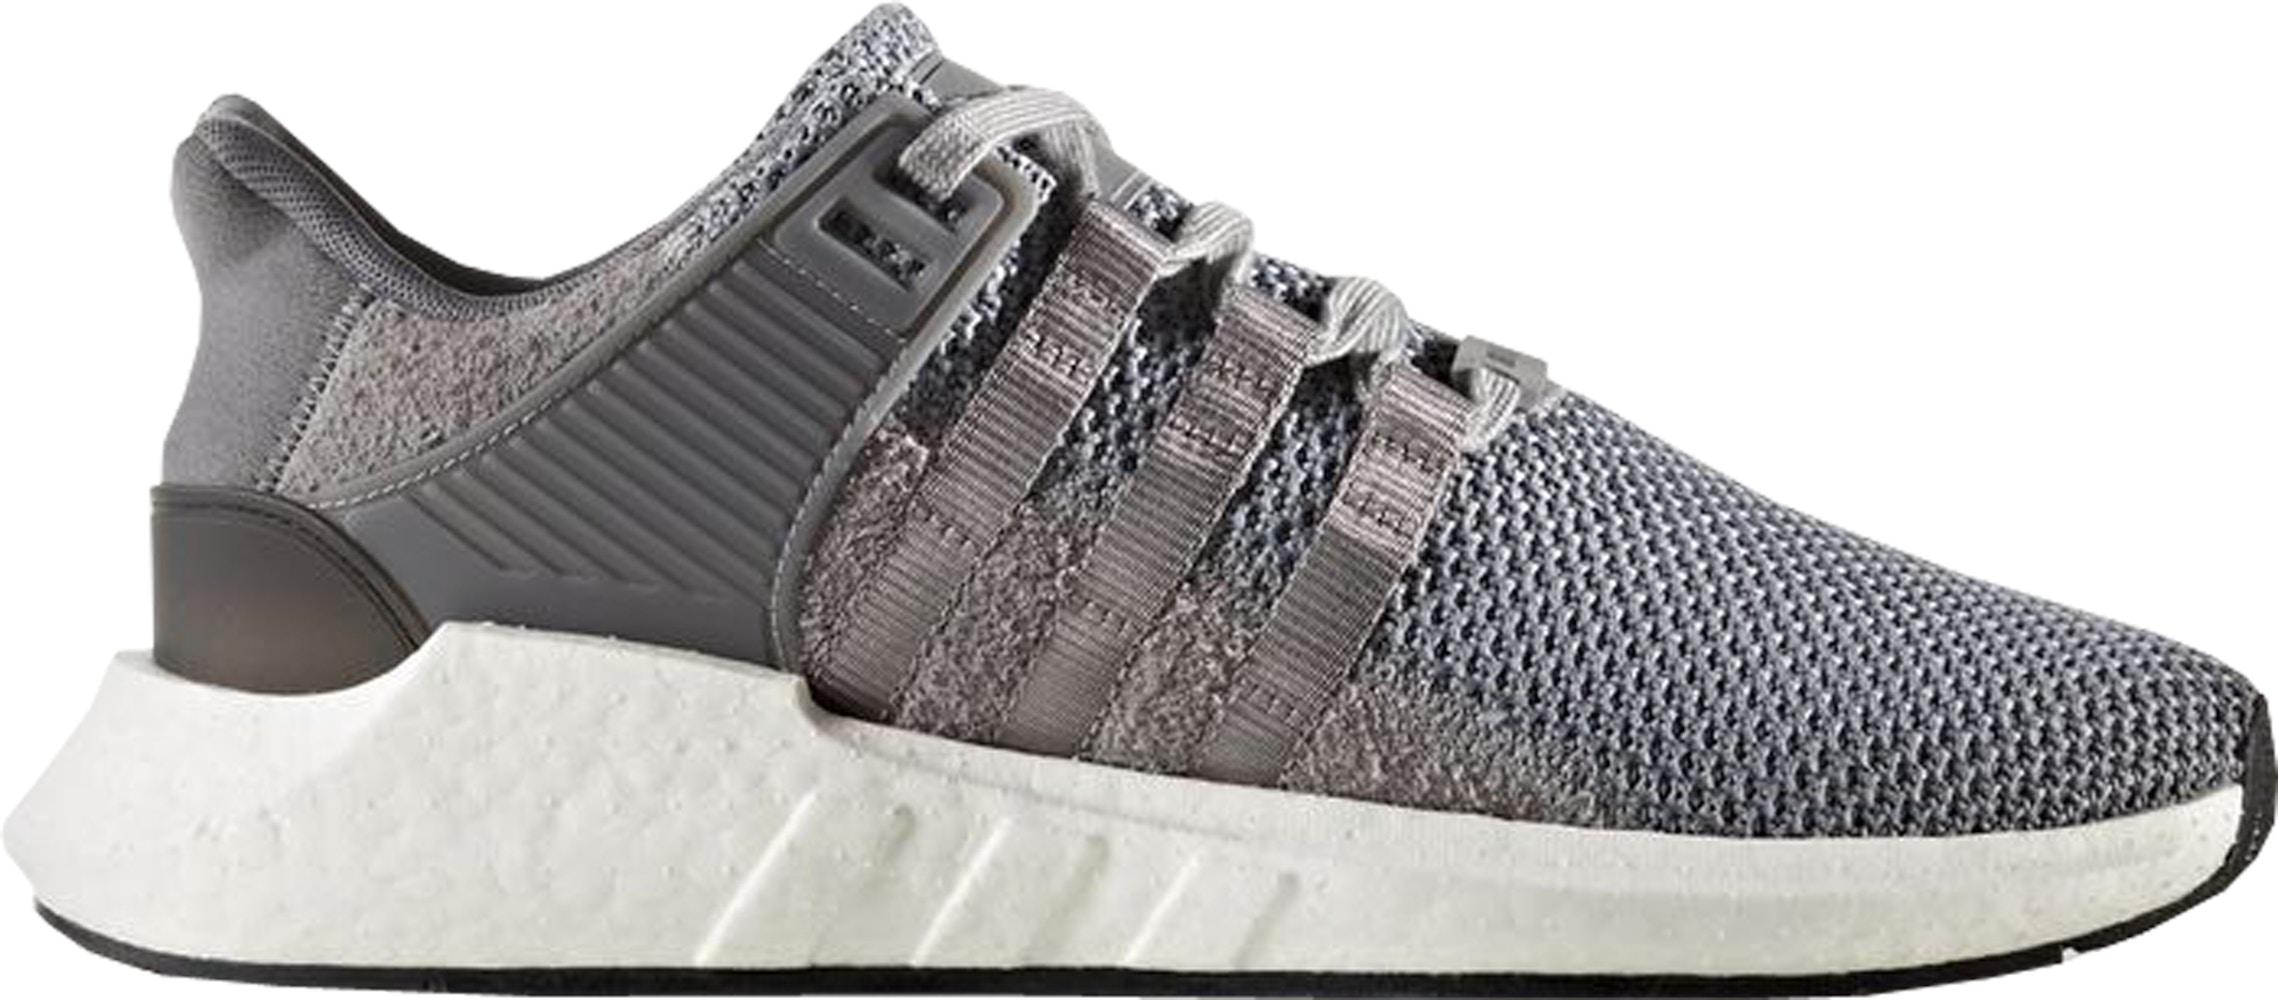 adidas EQT Support 93/17 Grey Heather